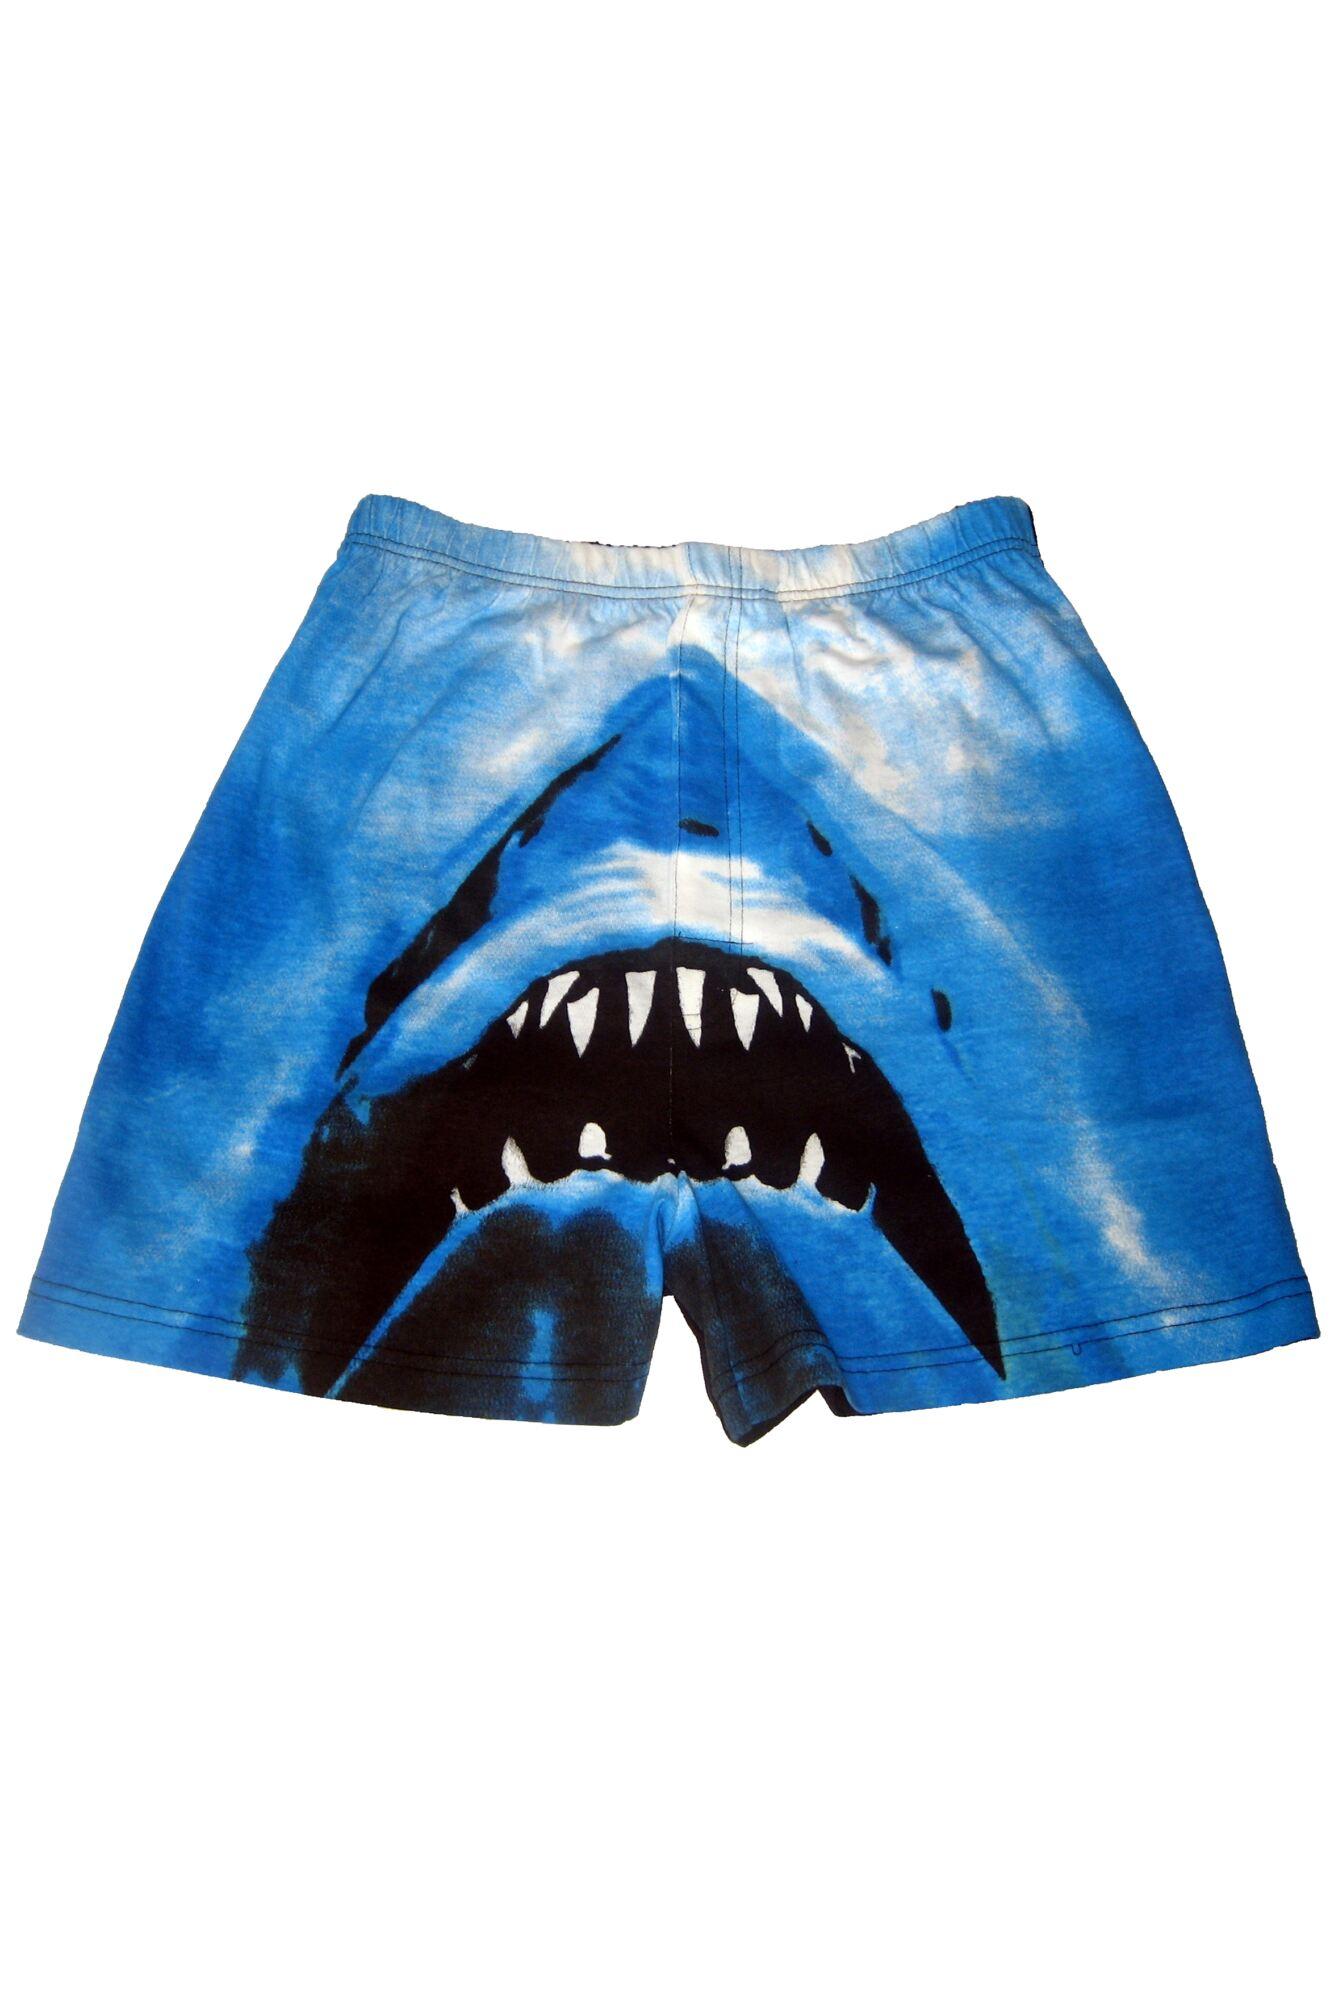 1 Pack Magic Boxer Shorts In Shark Design Men's - SOCKSHOP